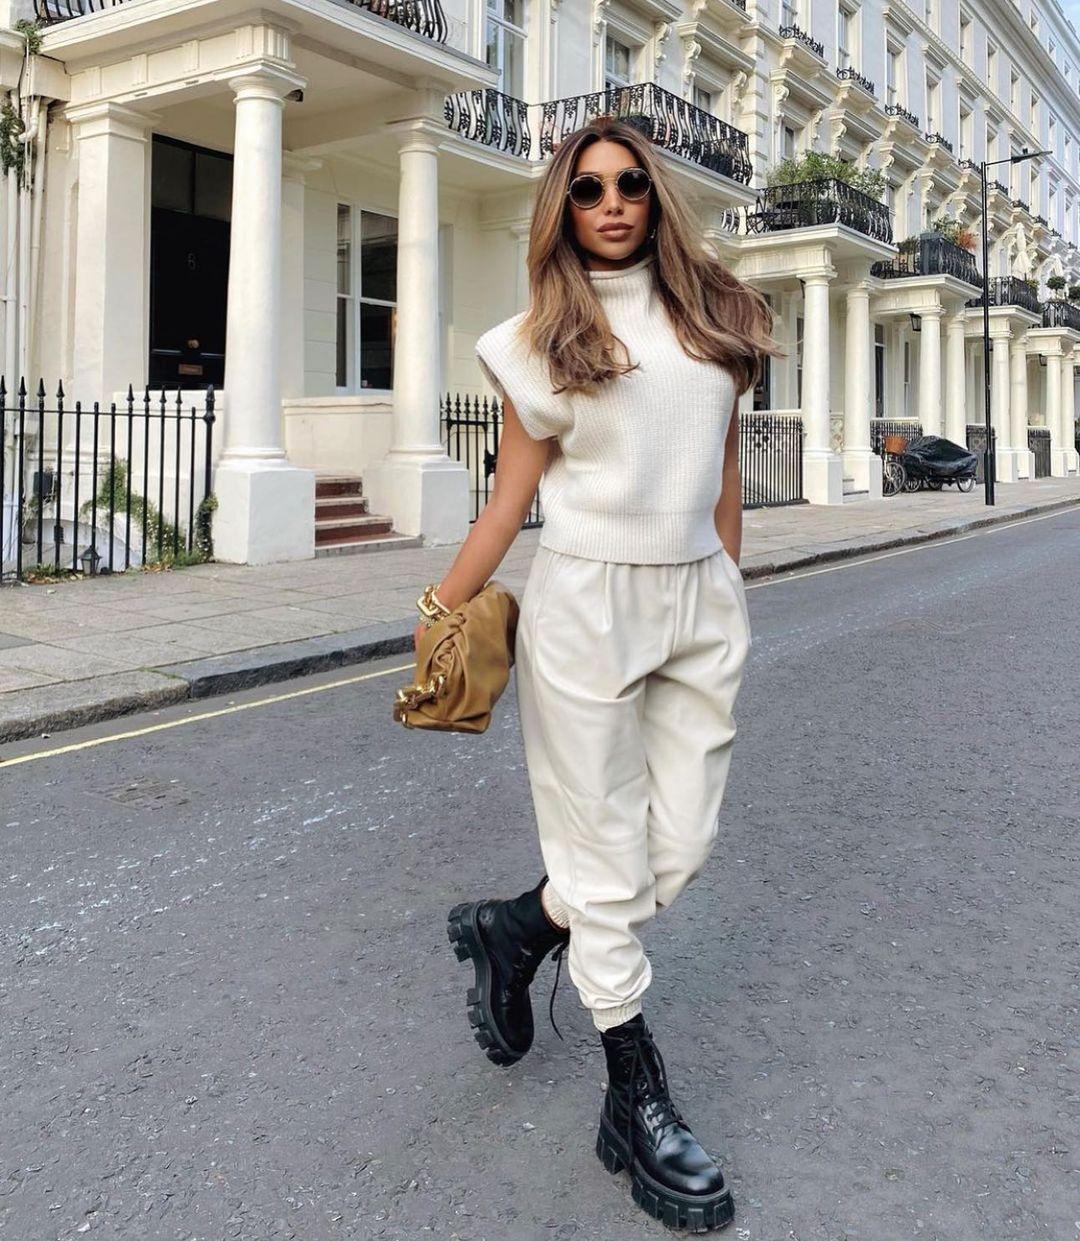 synthetic leather jogging pants de Zara sur zarastreetstyle